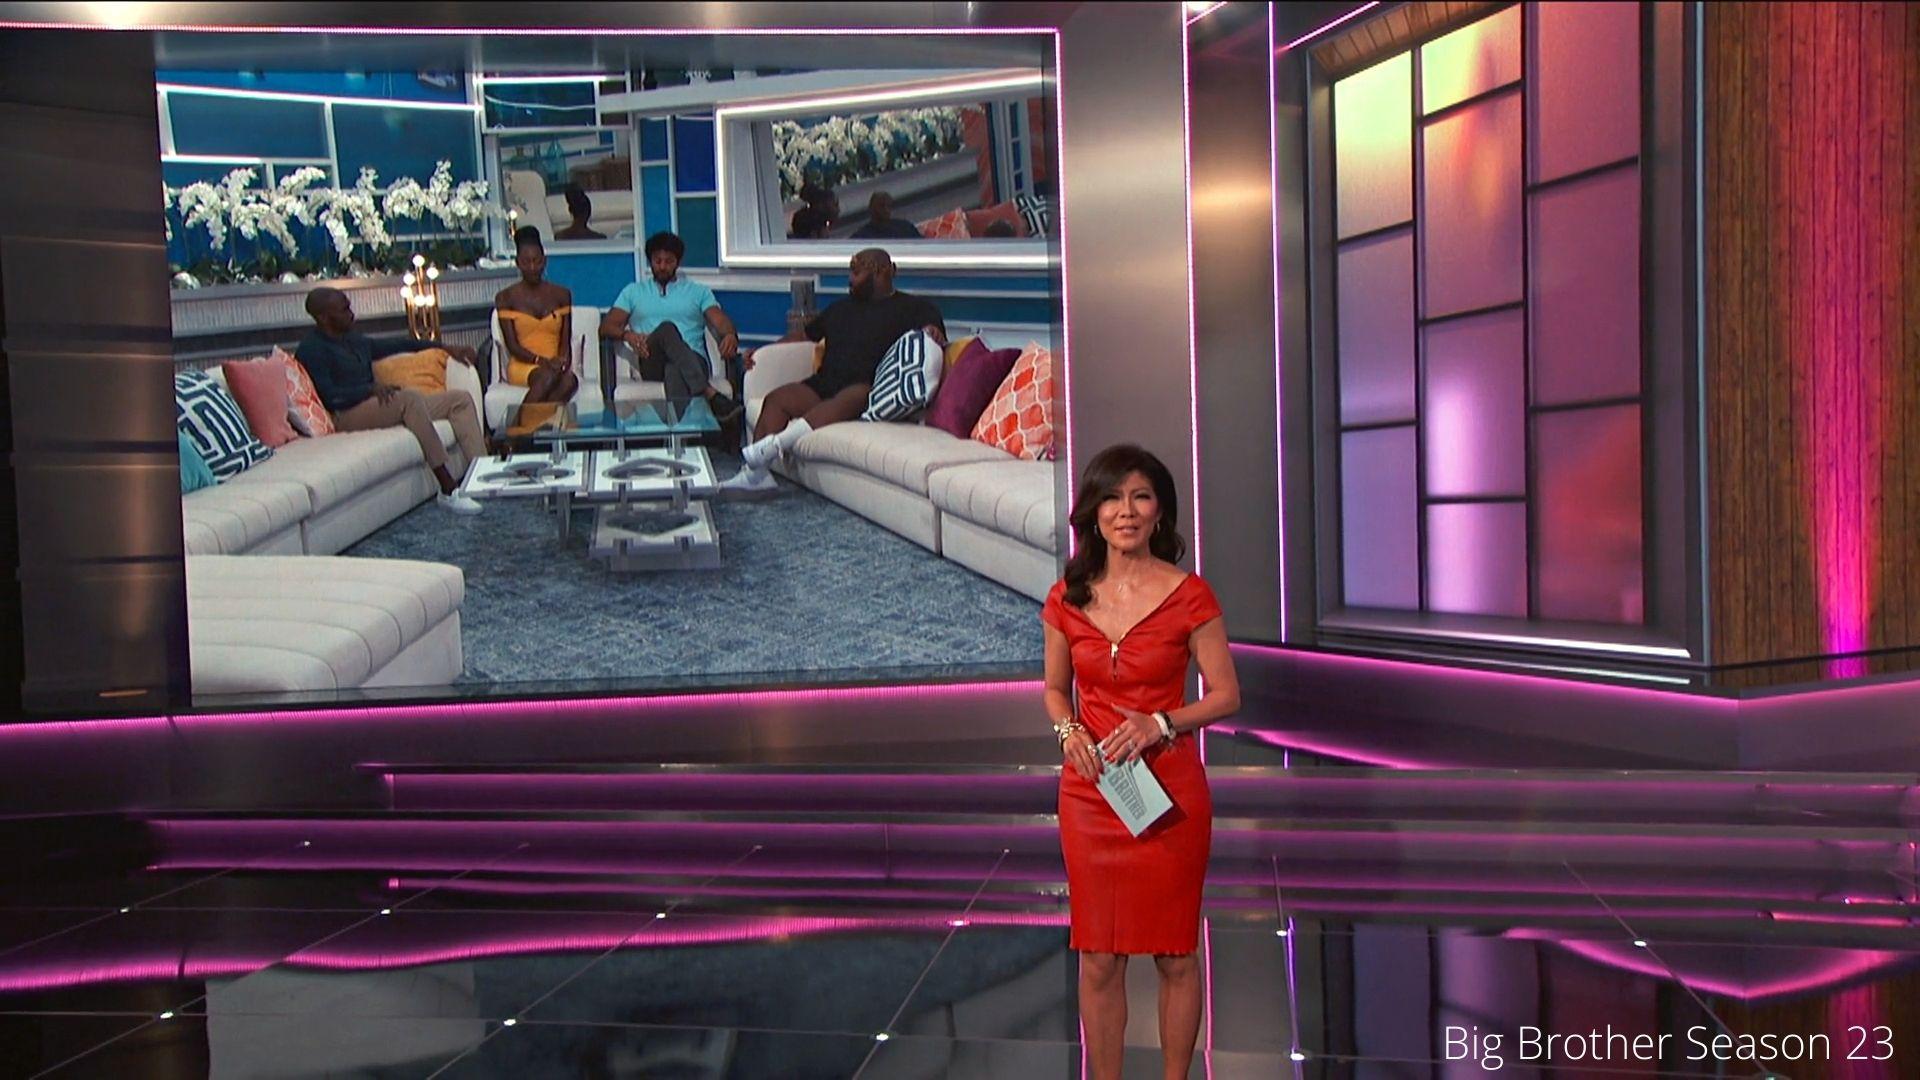 Big Brother Season 23 Episode 35